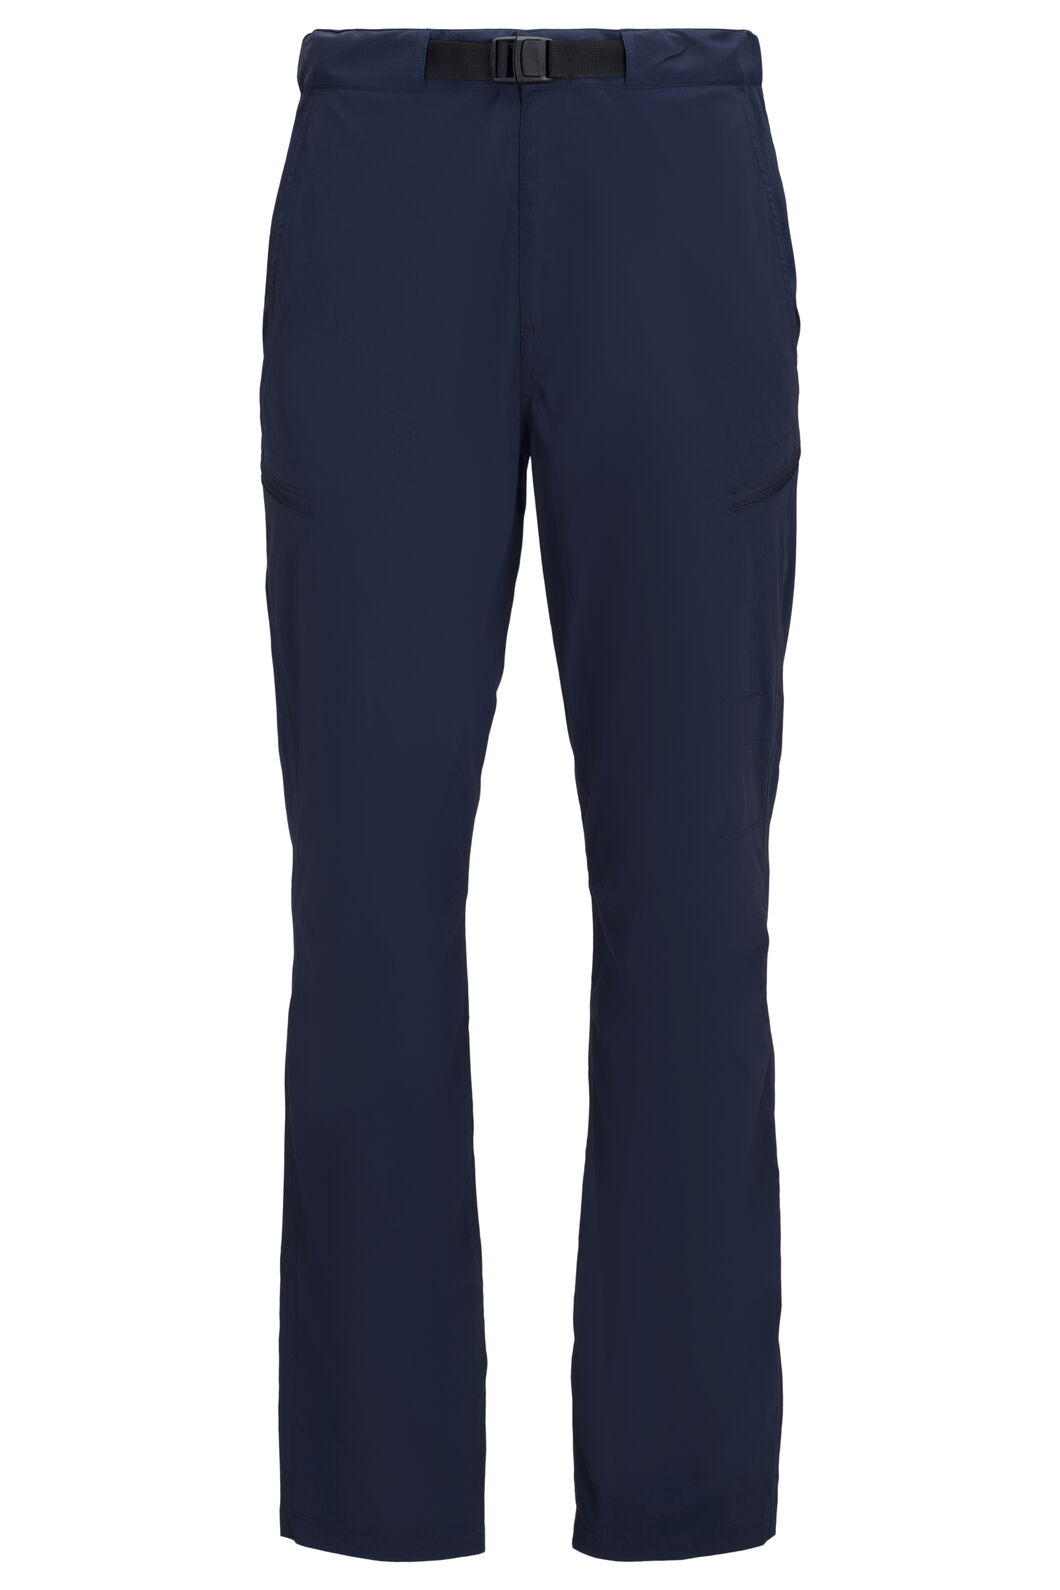 Macpac Drift Pants — Men's, Black Iris, hi-res